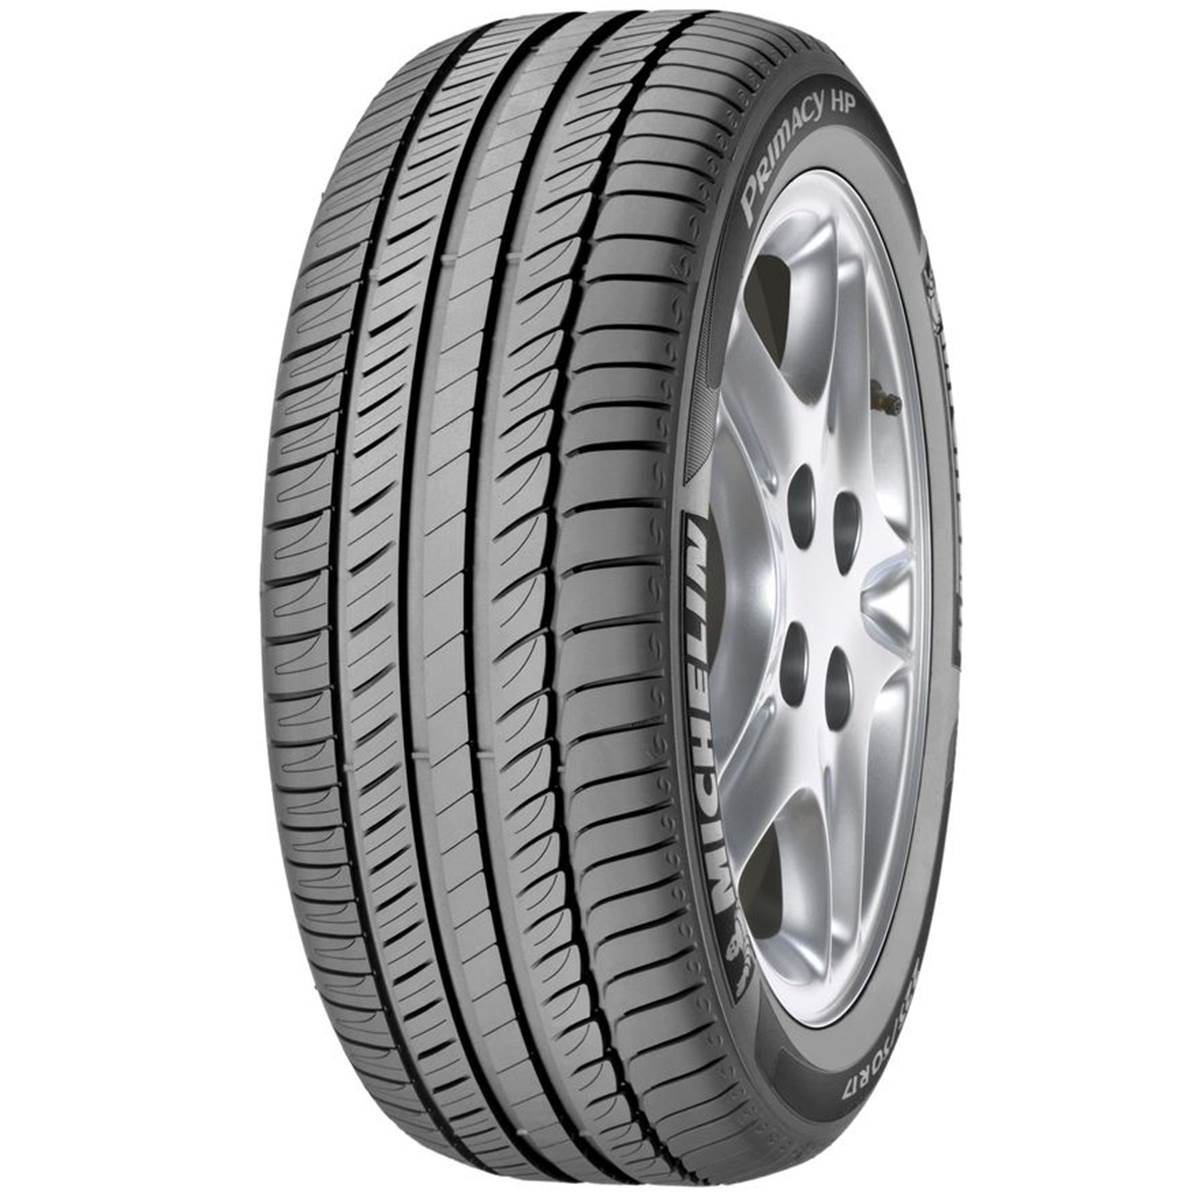 Pneu Michelin 255/40R17 94W Primacy Hp